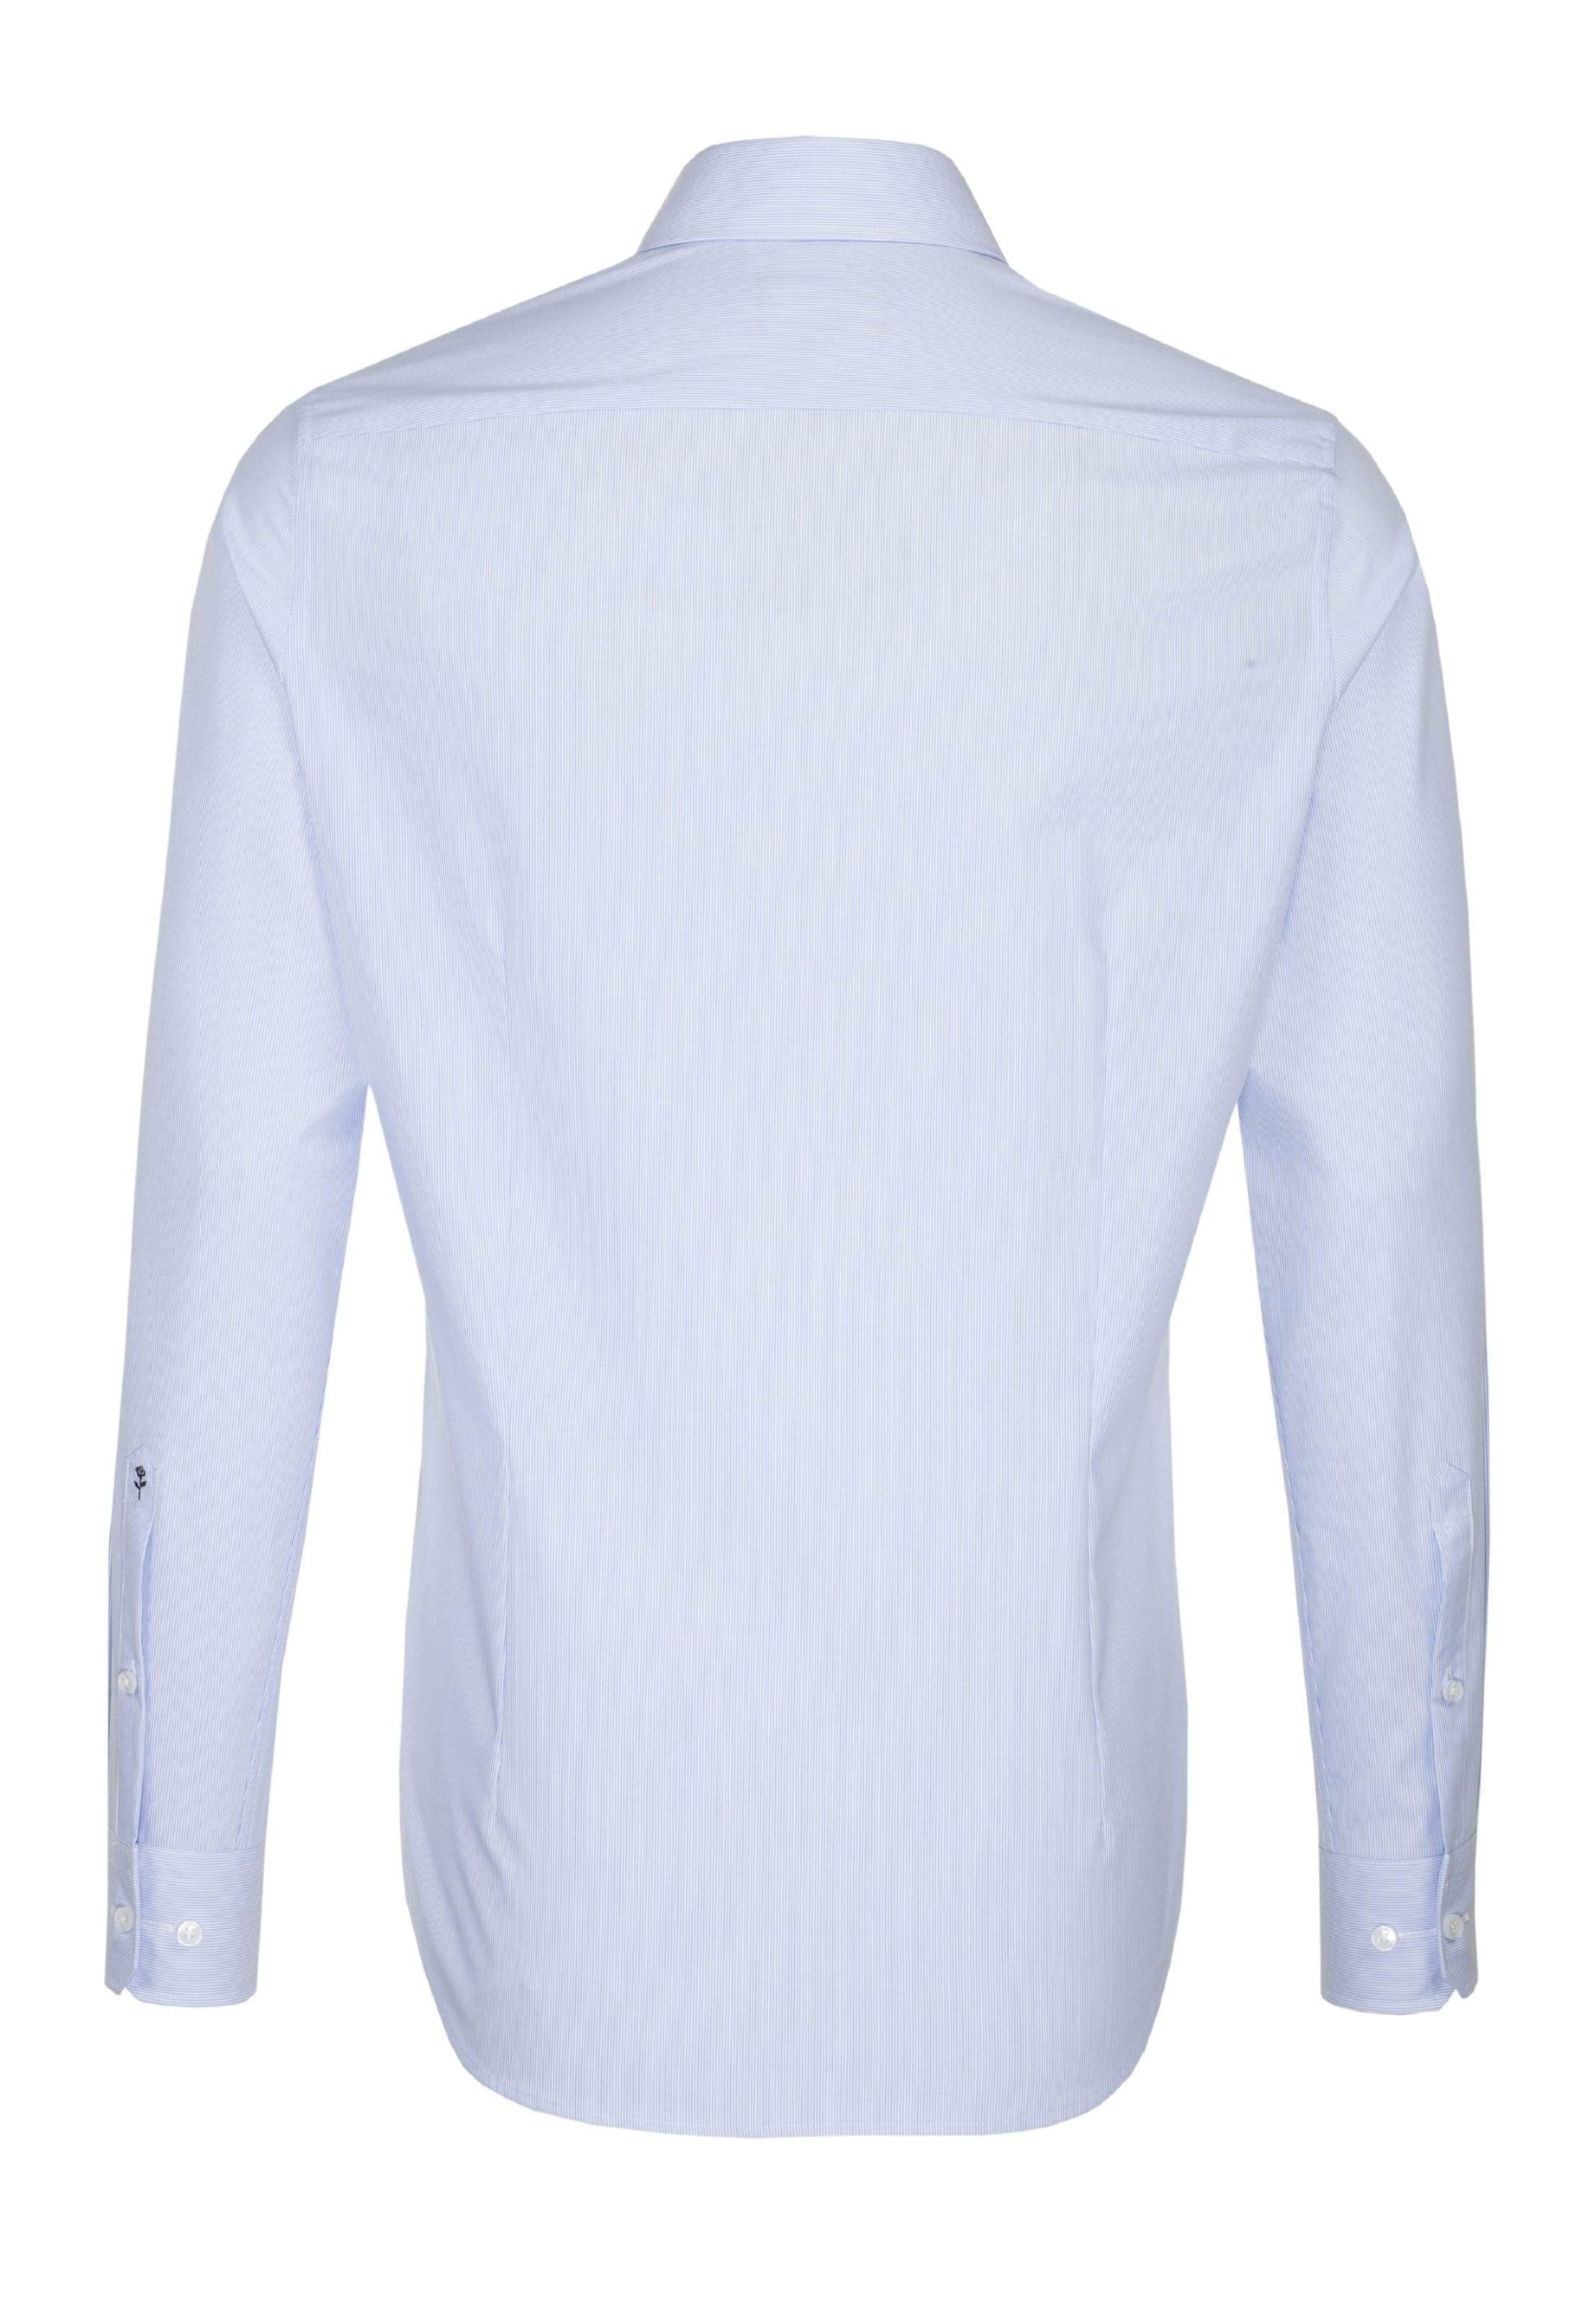 Seidensticker Business 'slim' HellblauWeiß In Hemd l1FKcJ